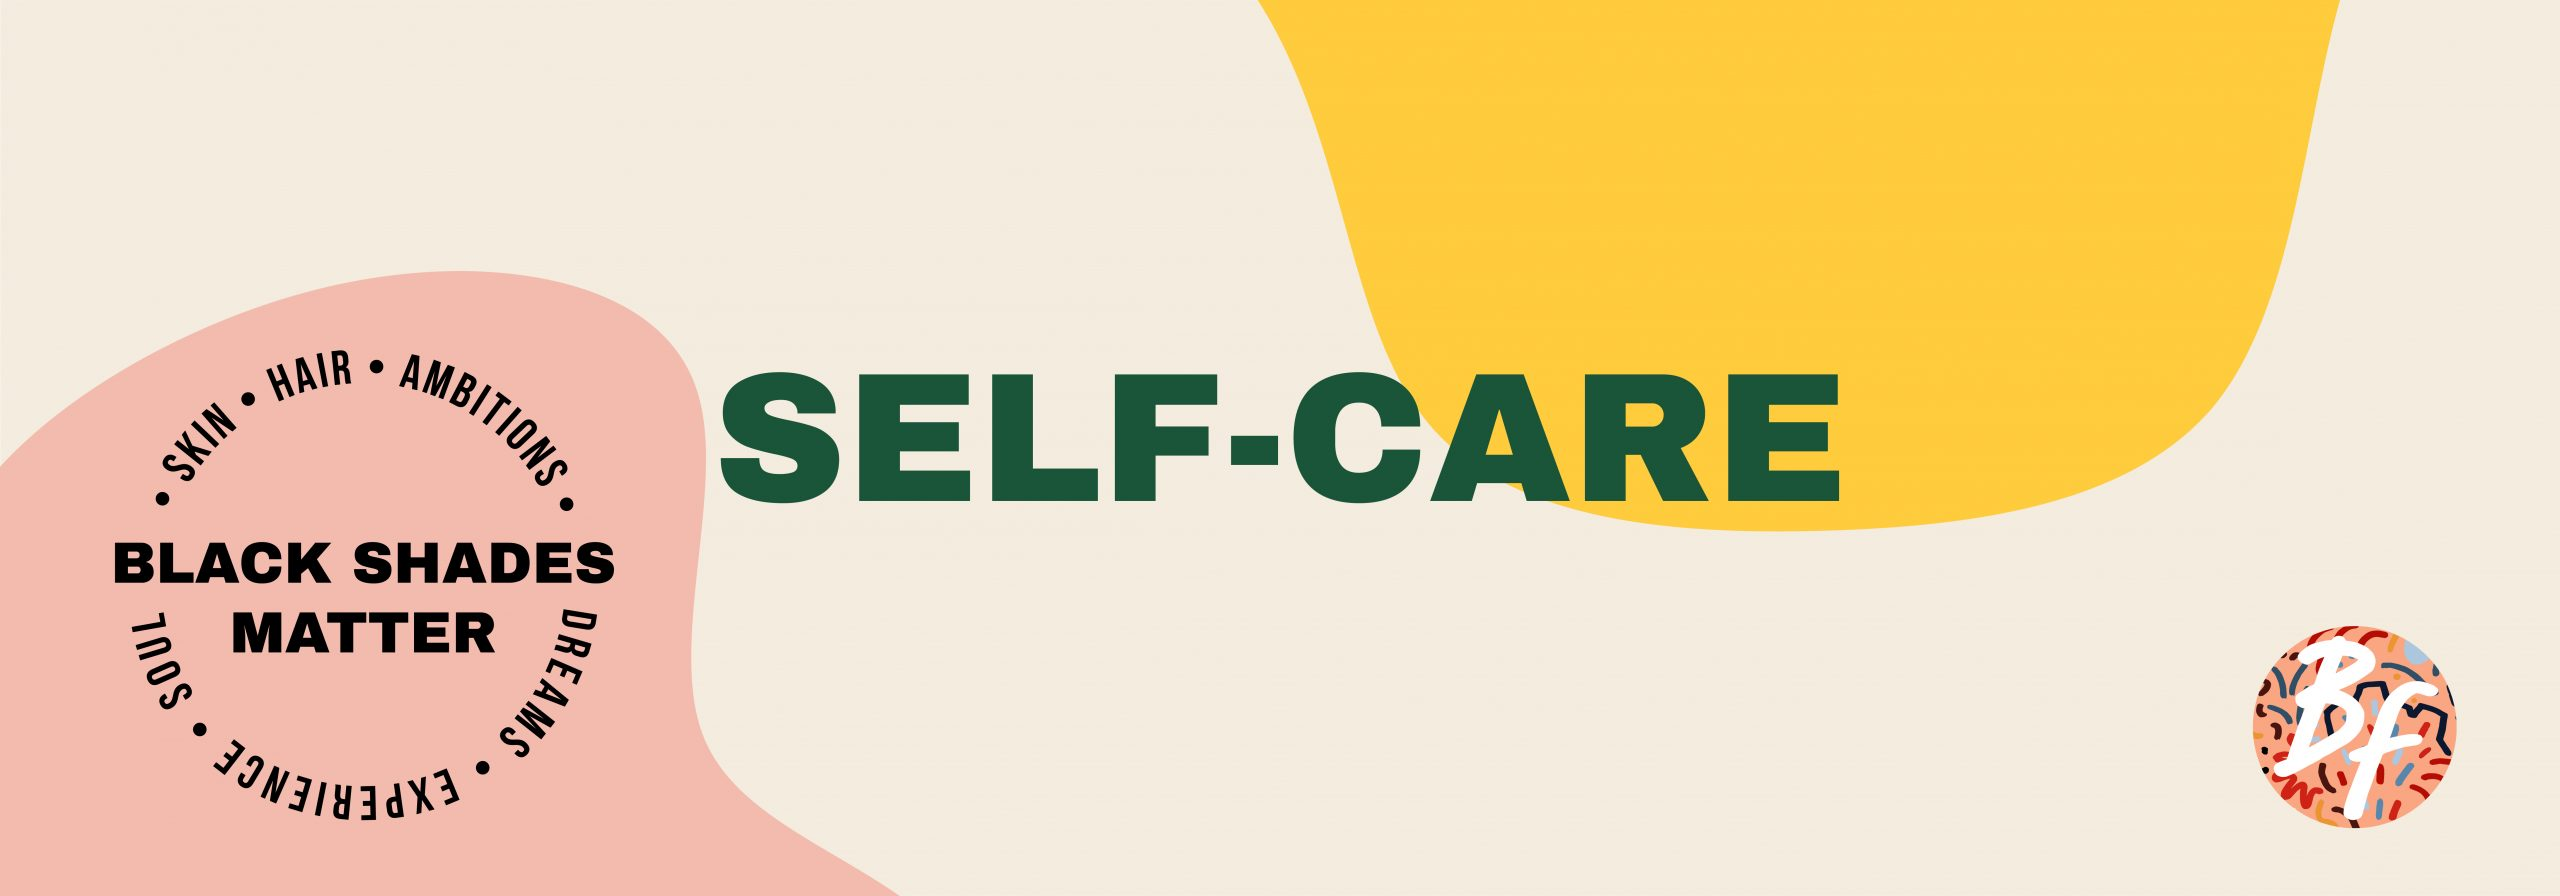 https://www.blackfest.co.uk/wp-content/uploads/2021/06/Lush-Self-care-banner-copy@2x-100-scaled.jpg